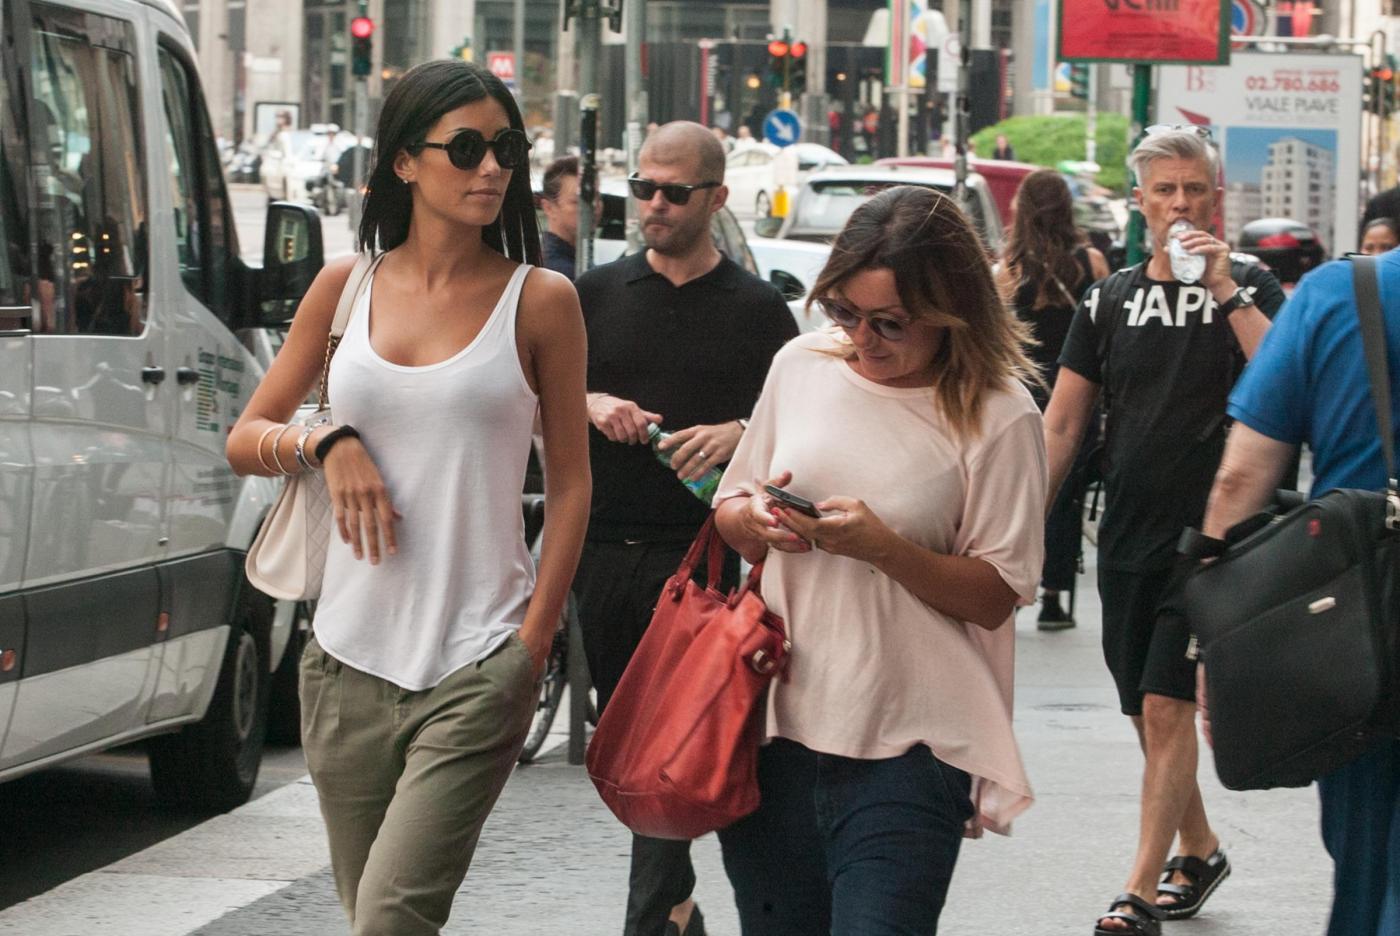 "Federica Nargi, shopping ""consolatorio"" dopo Berlino: con lei un'amica04"